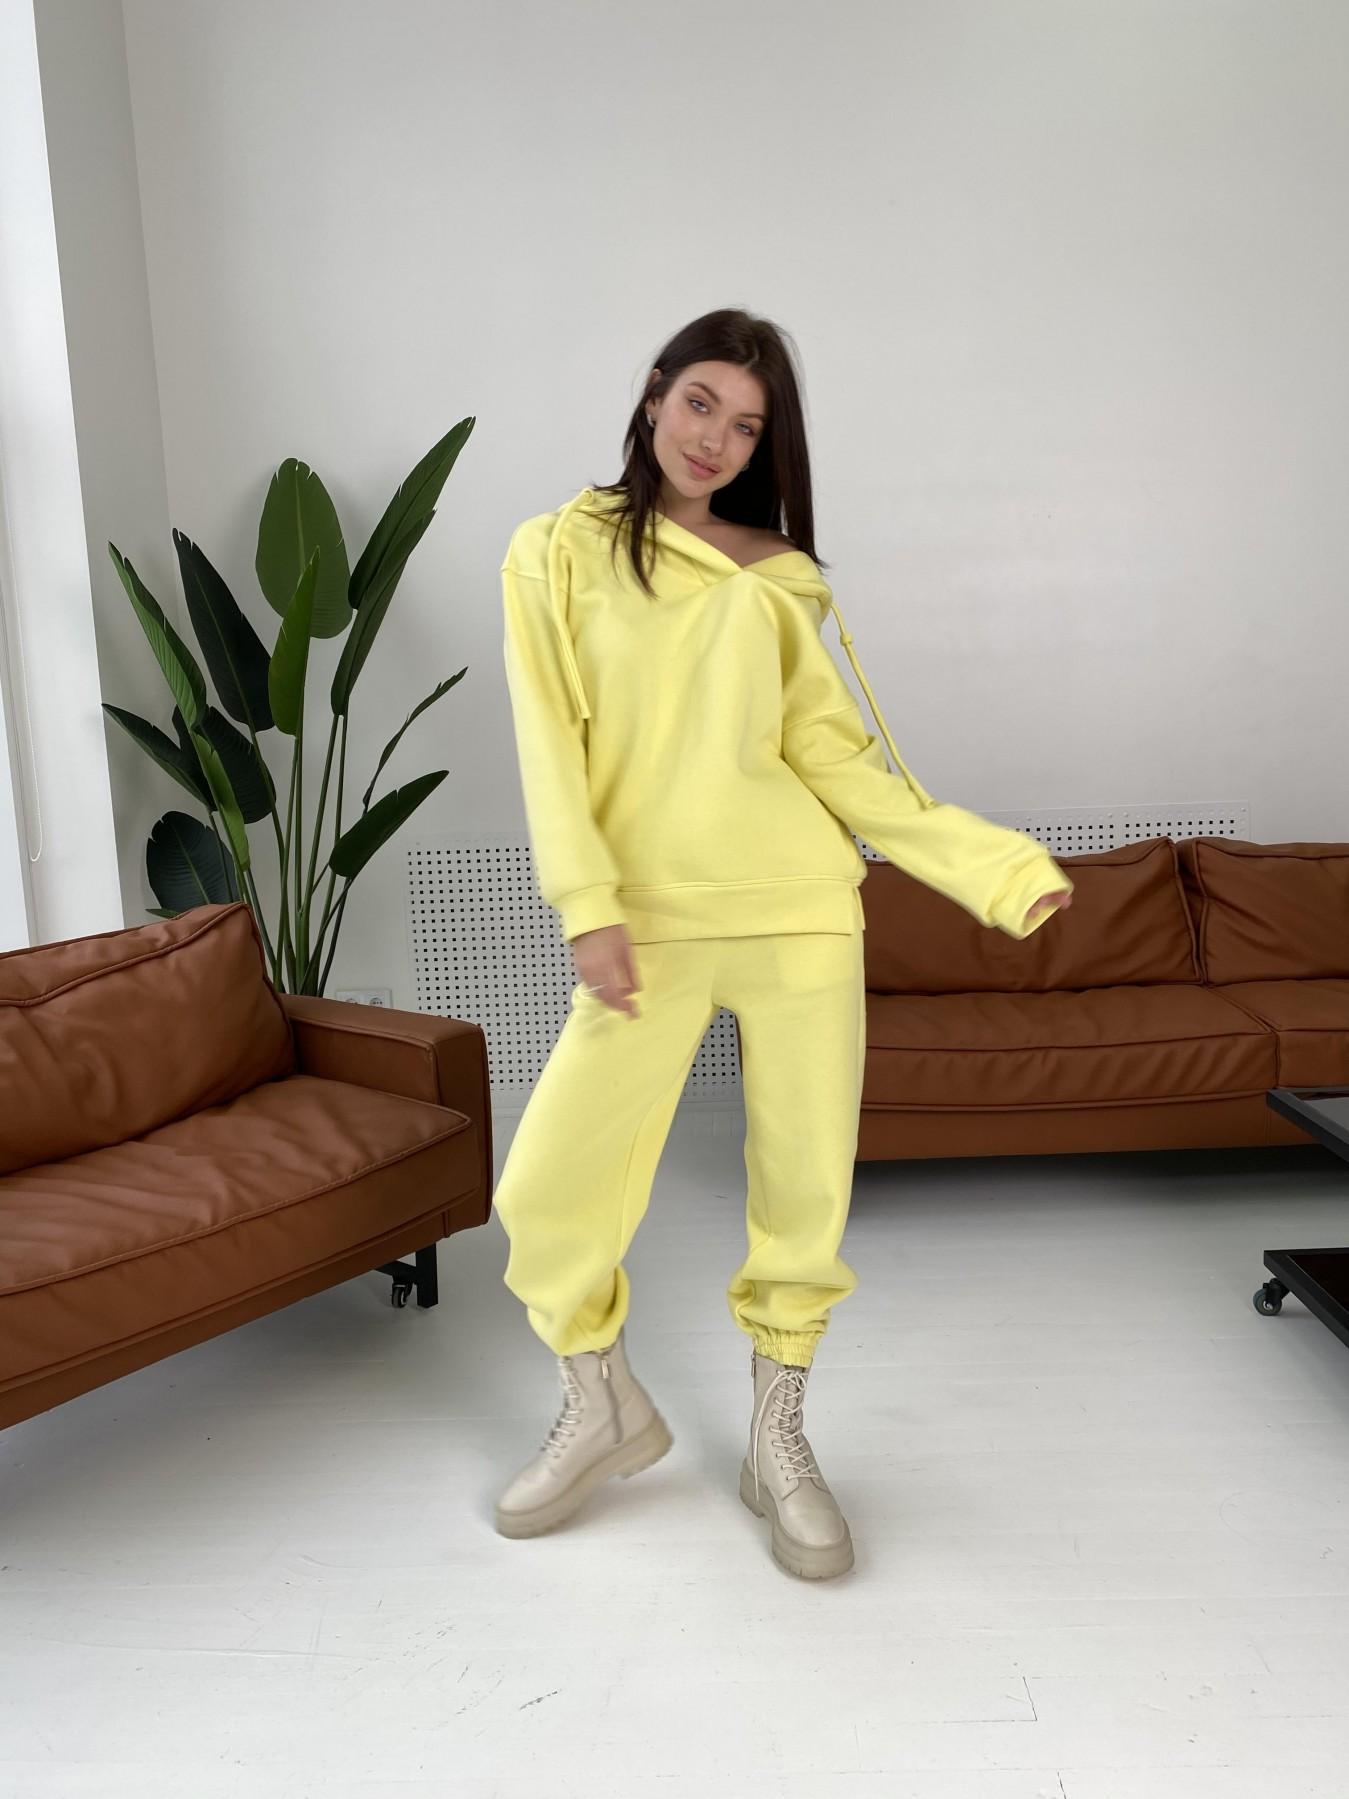 Ярис костюм из 3х нитки 10789 АРТ. 47259 Цвет: Лимон - фото 2, интернет магазин tm-modus.ru